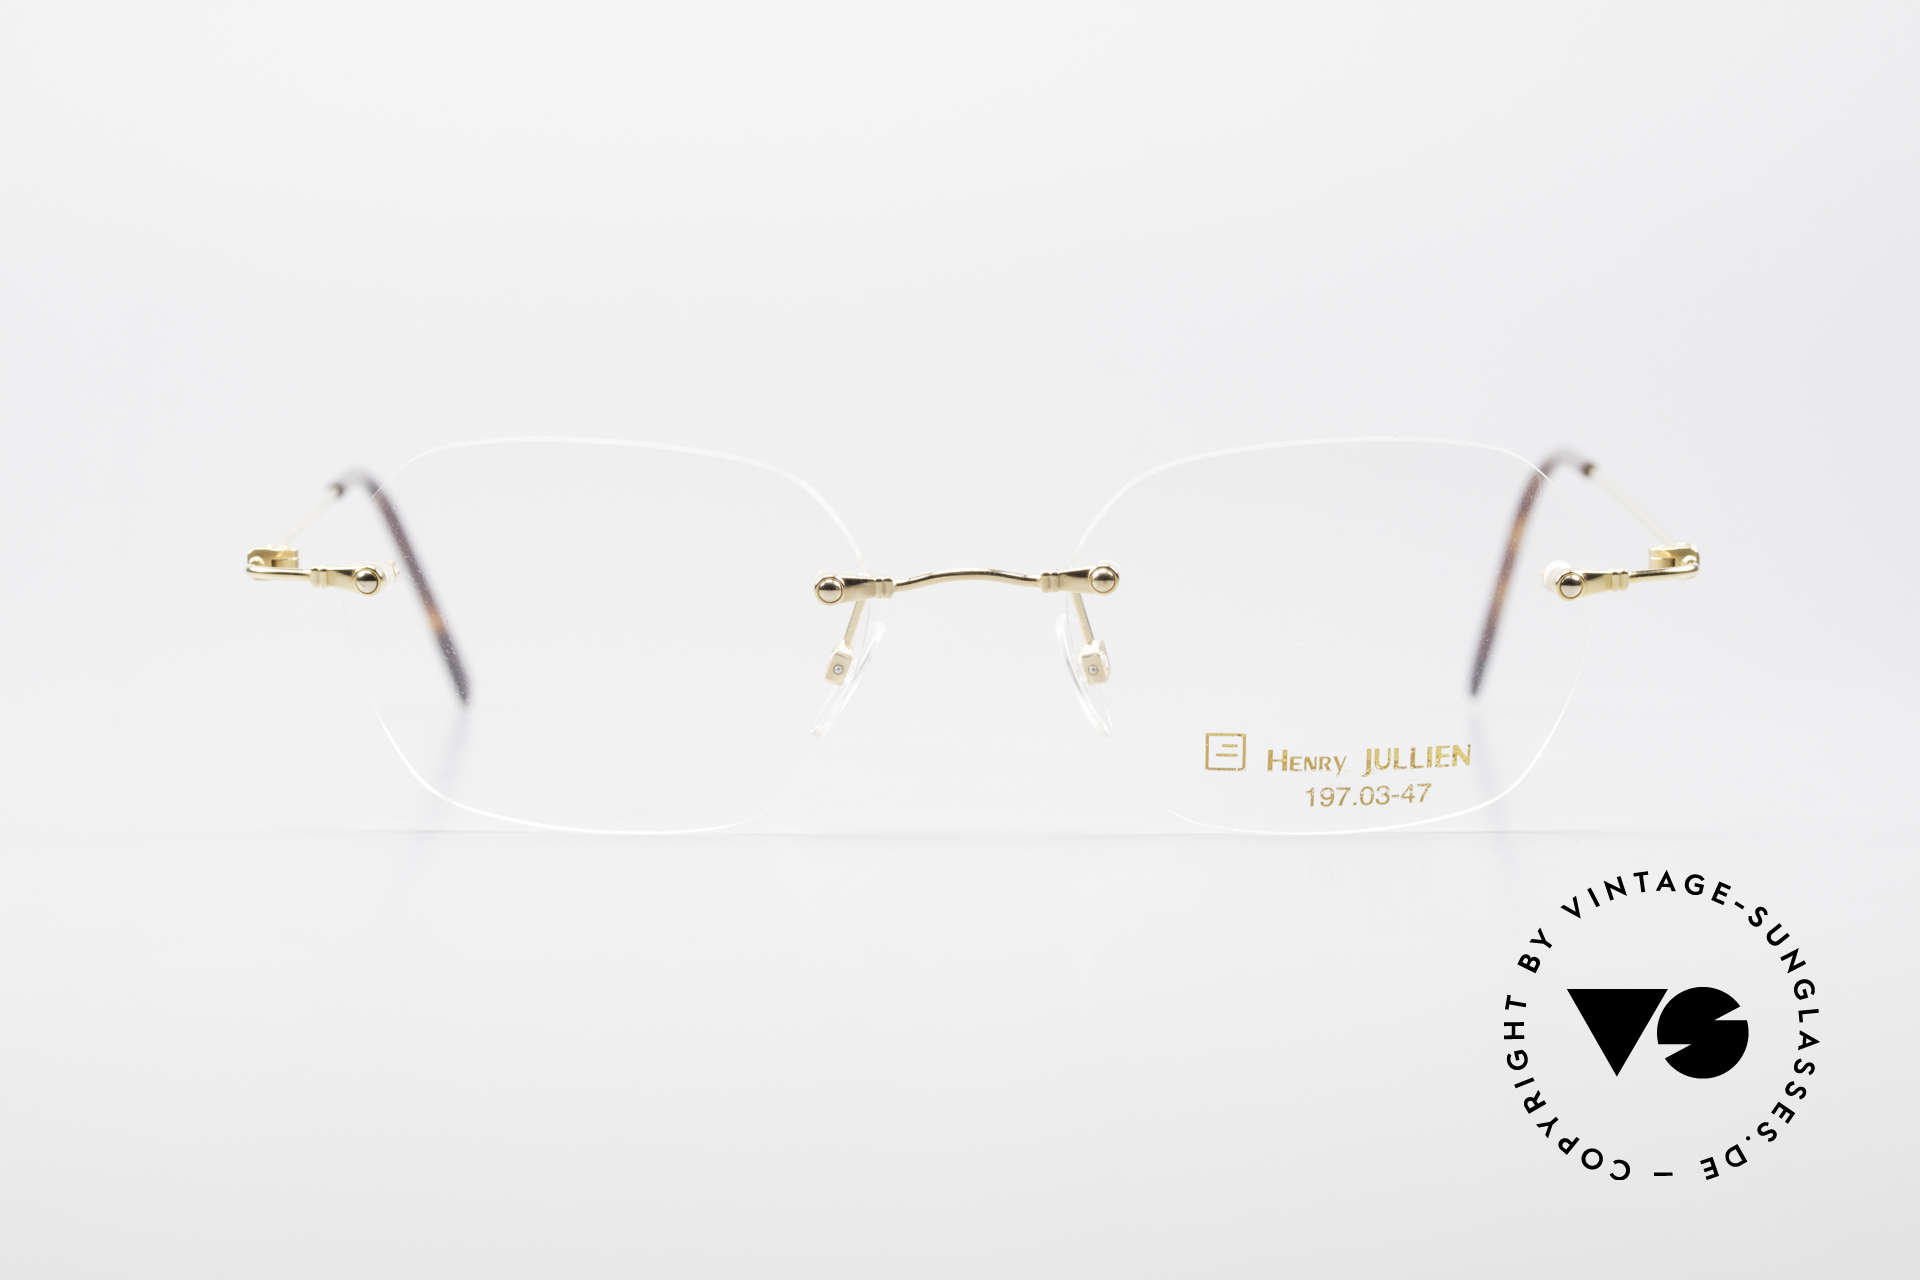 Henry Jullien Melrose 4000 Rimless Vintage Frame 90's, Jullien is well-known for high-end gold processing, Made for Men and Women